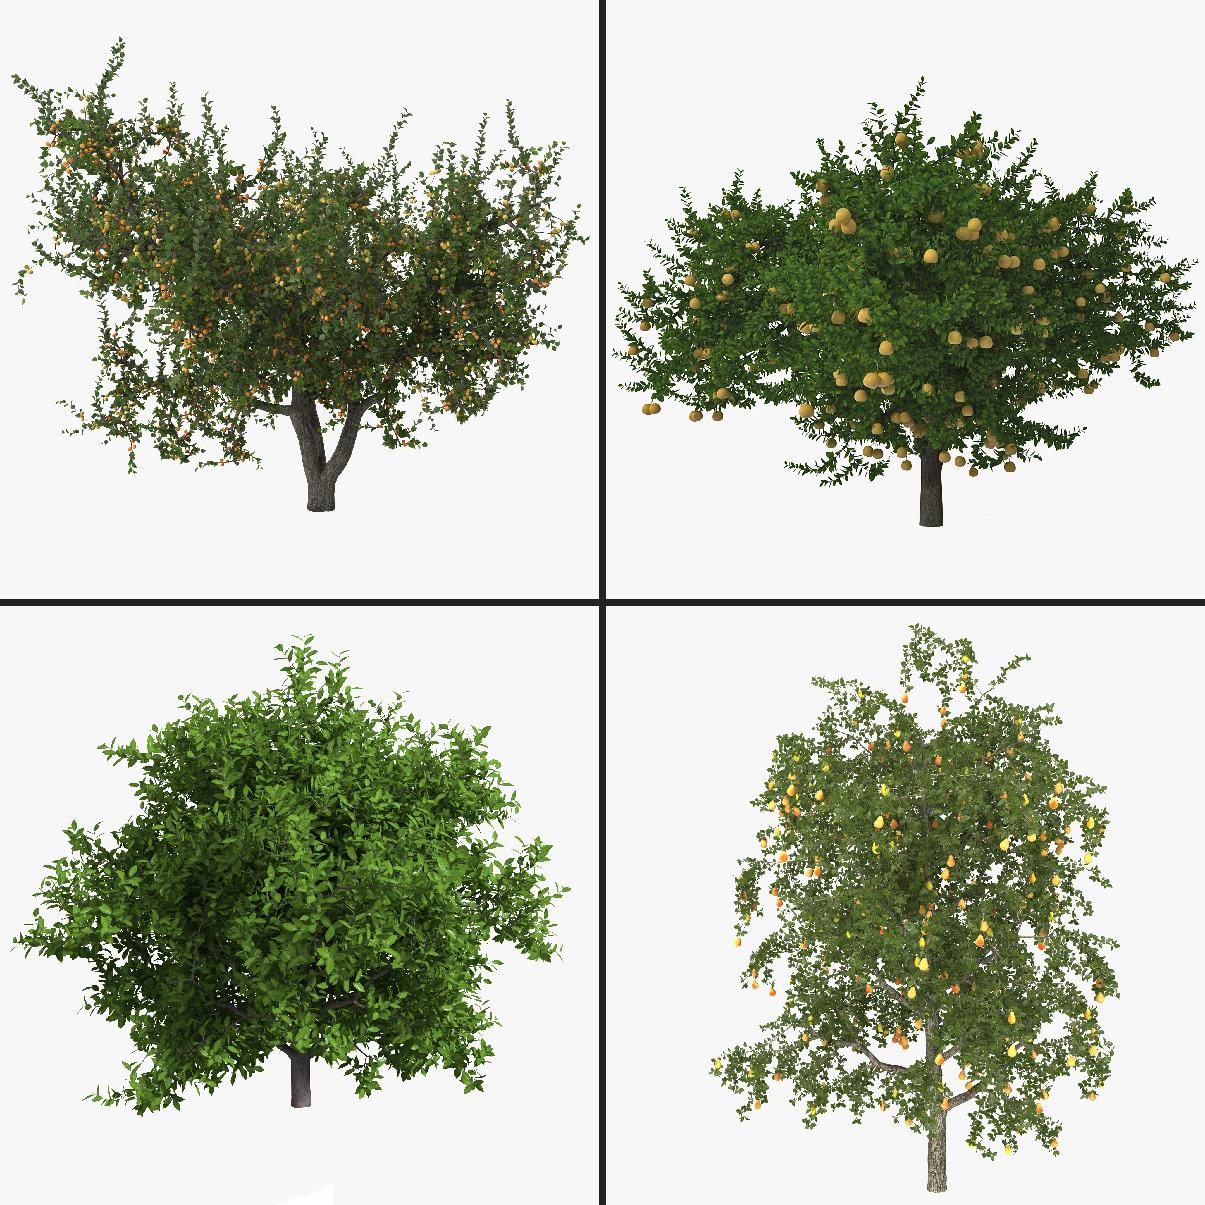 3dsmax fruit tree 2